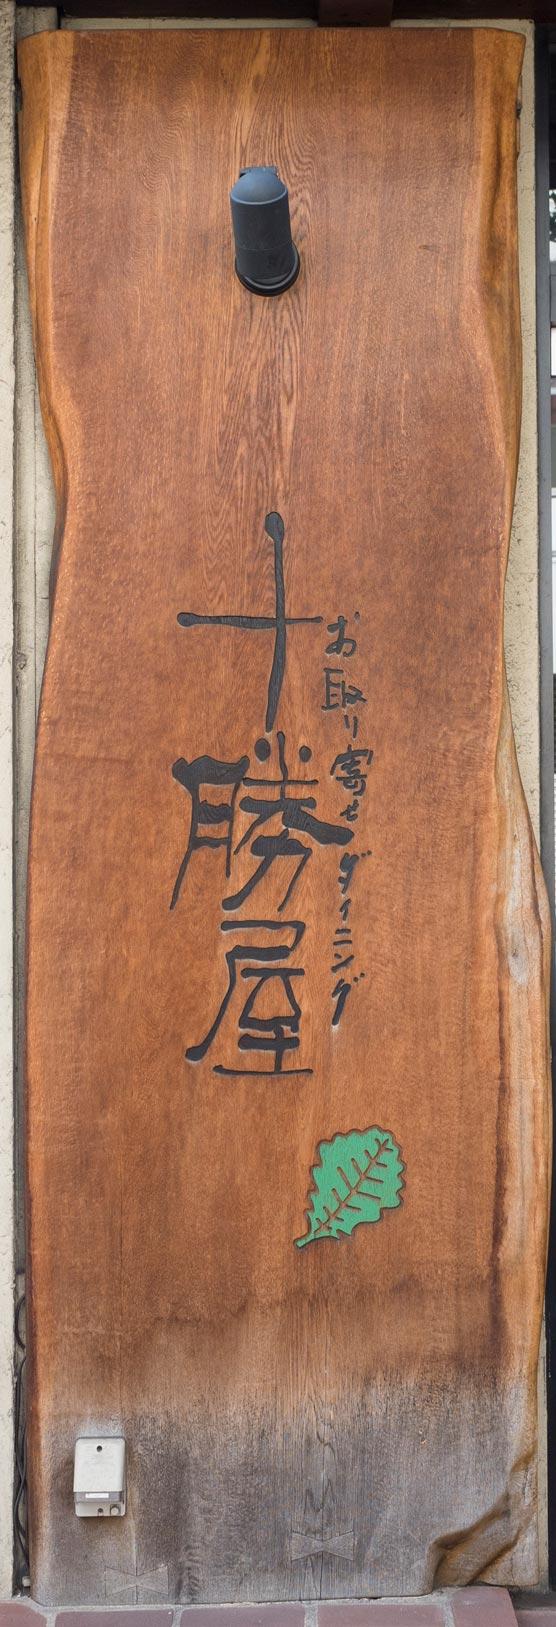 2017-09-03-jp-tokyo-ginza-signboard-03.jpg